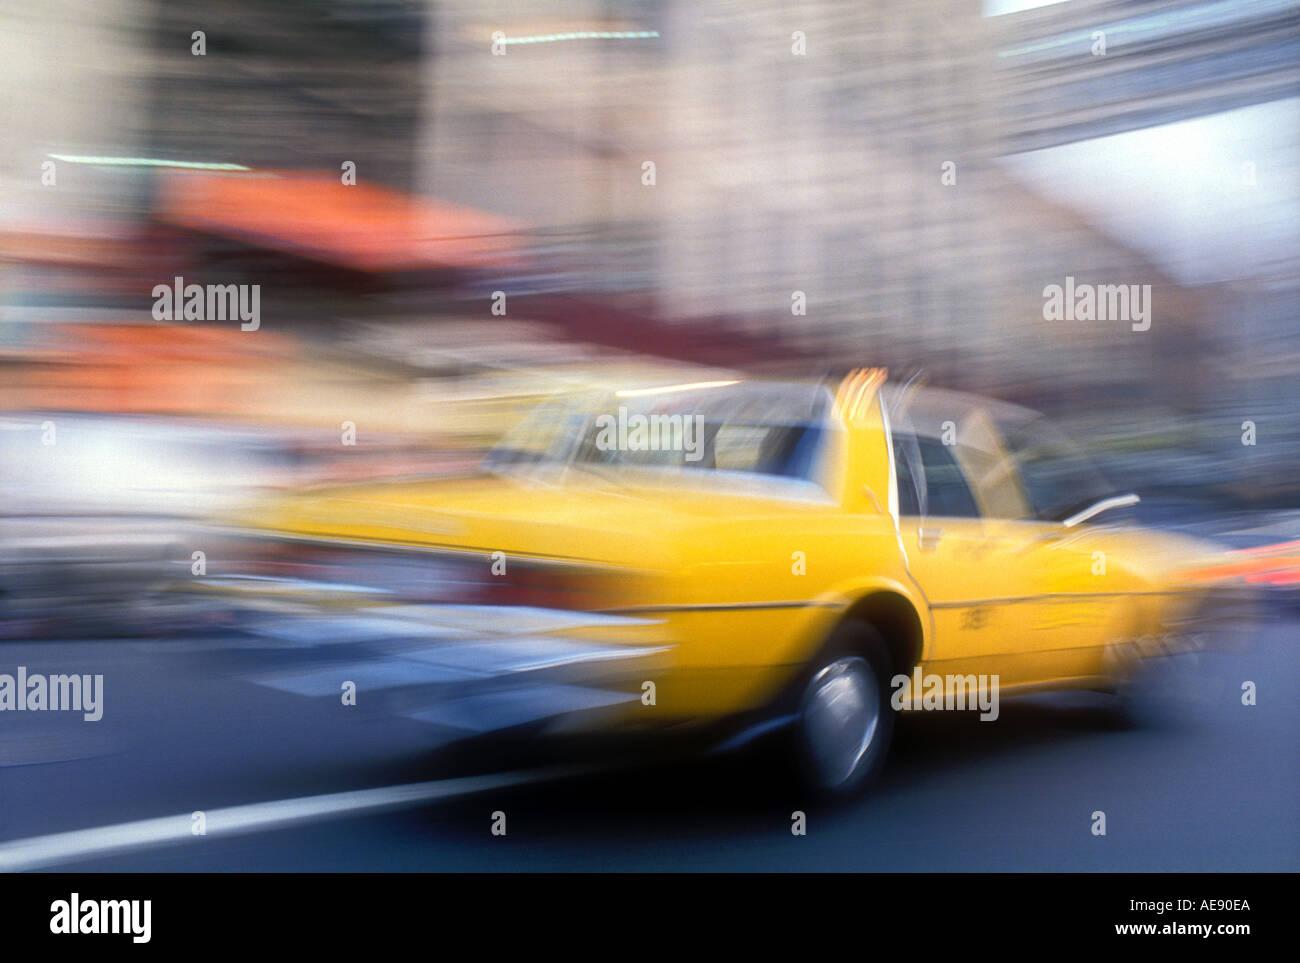 Blurred taxi speeding in New York City New York USA Stock Photo